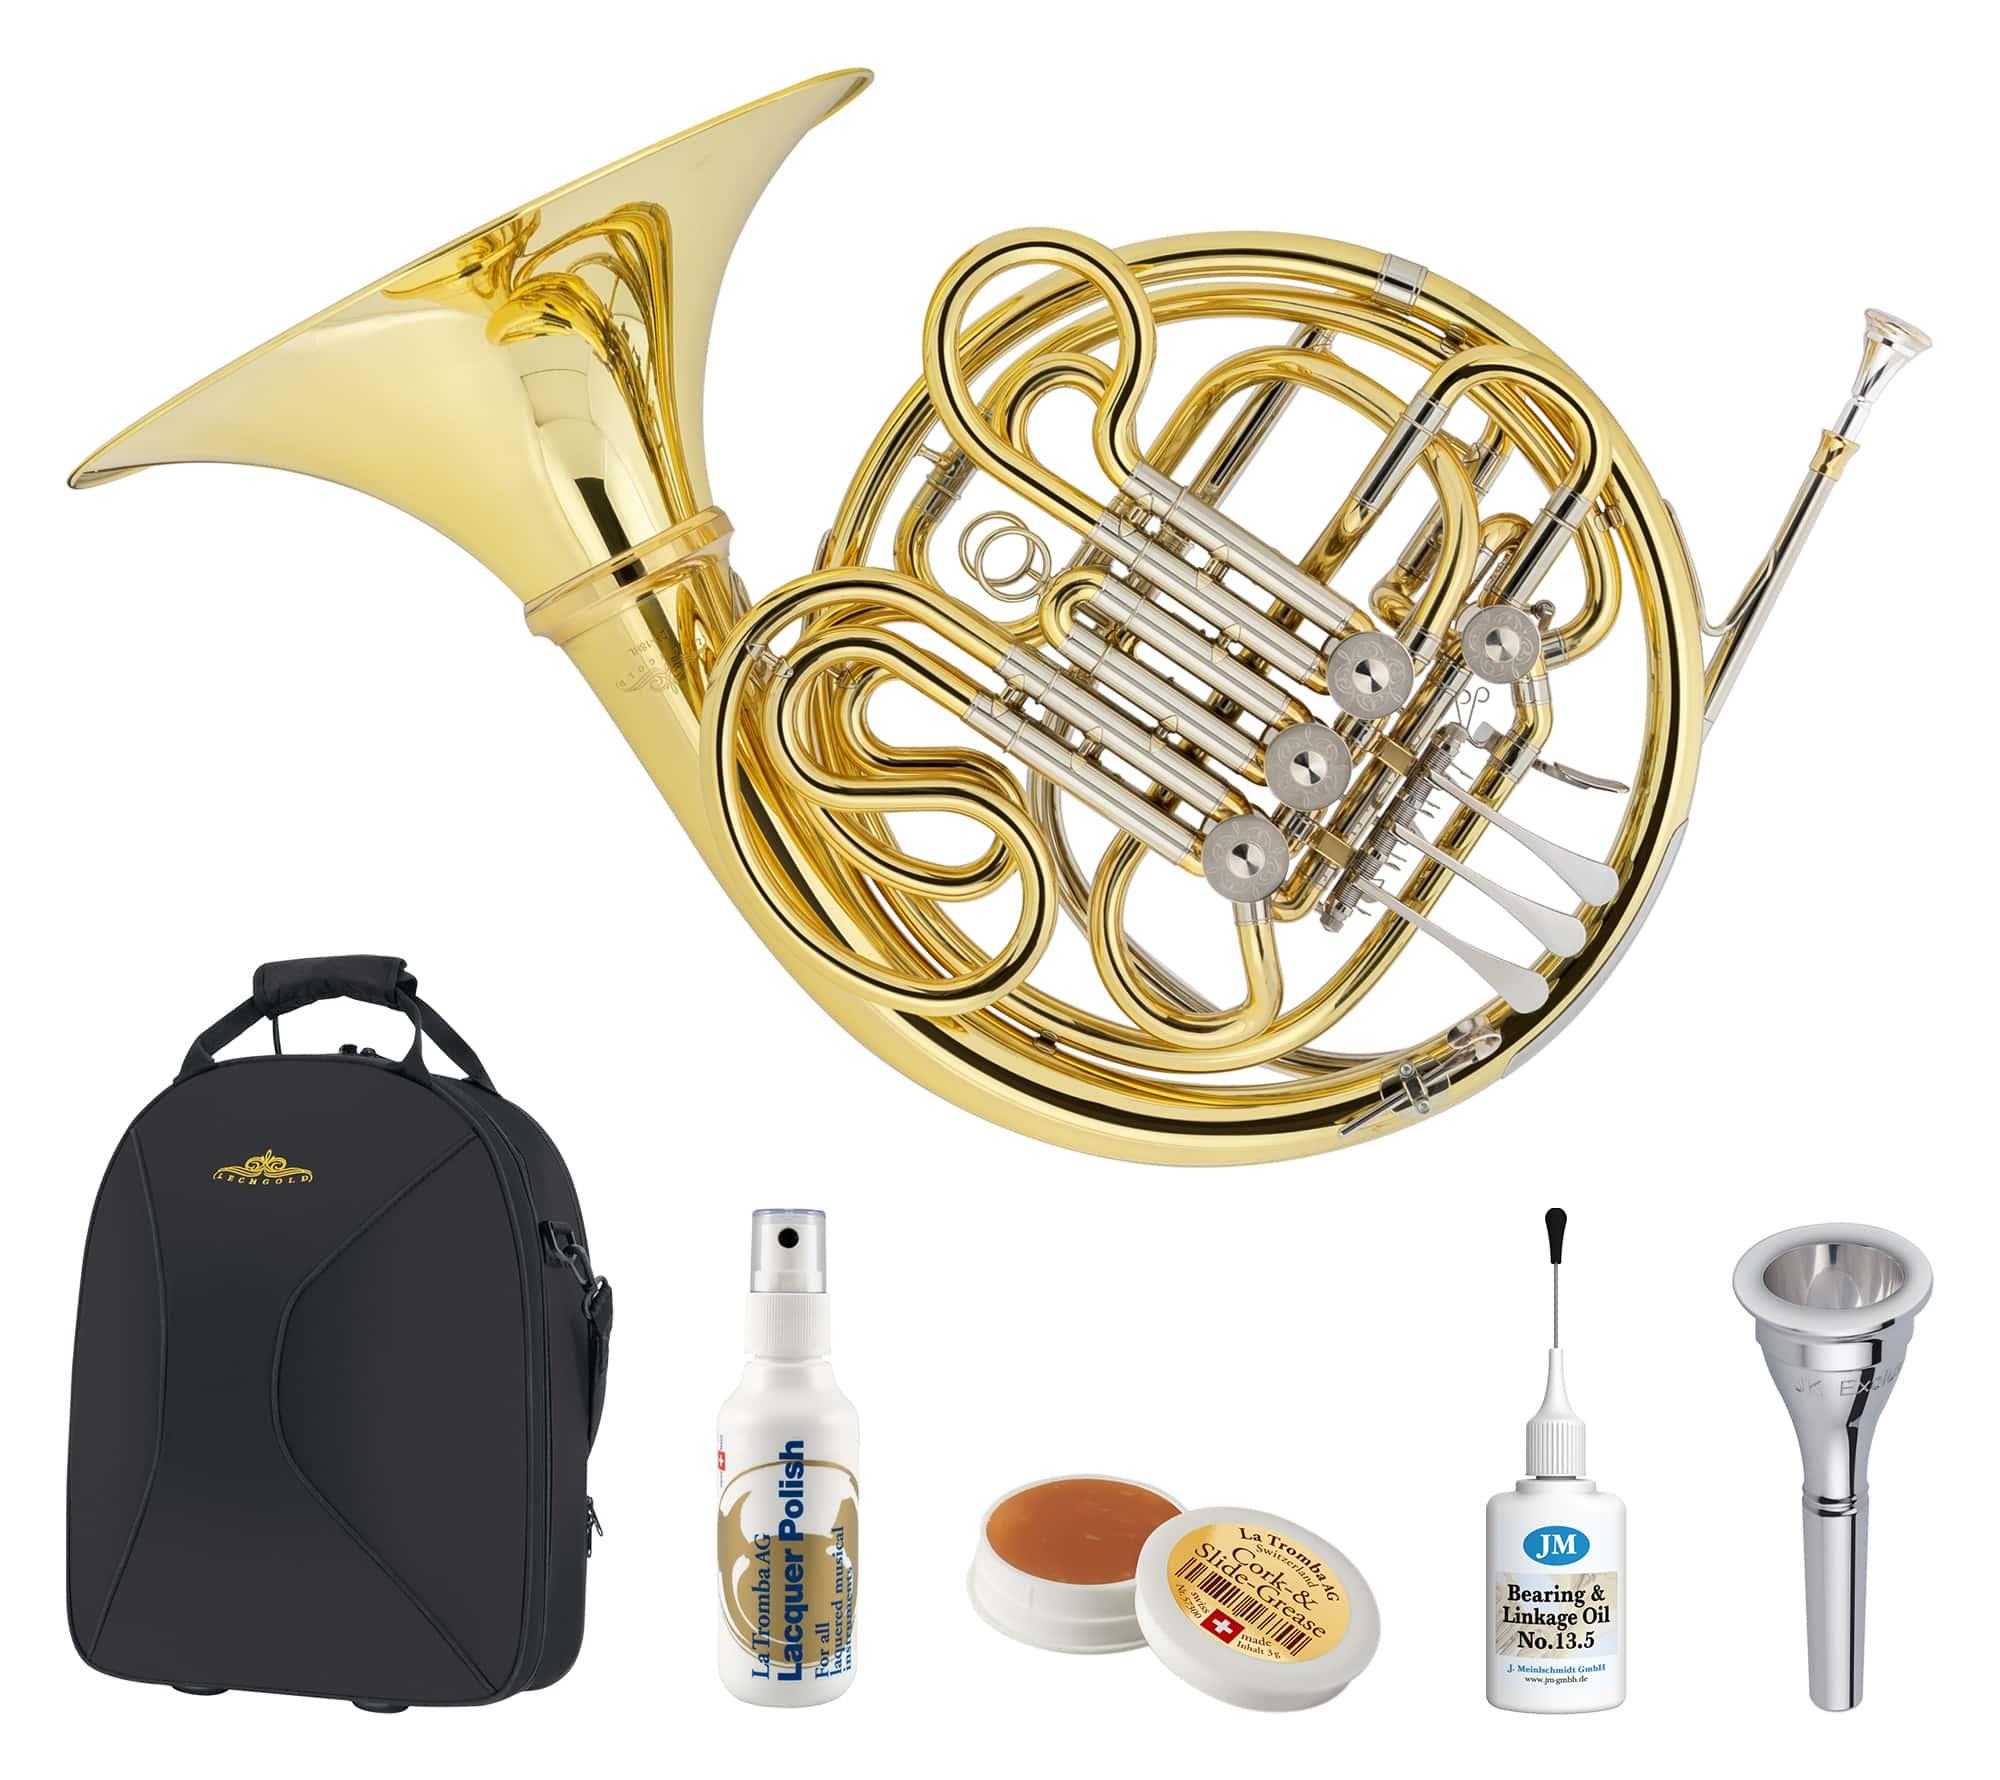 Hoerner - Lechgold DH 18HL Doppelhorn Deluxe Set - Onlineshop Musikhaus Kirstein